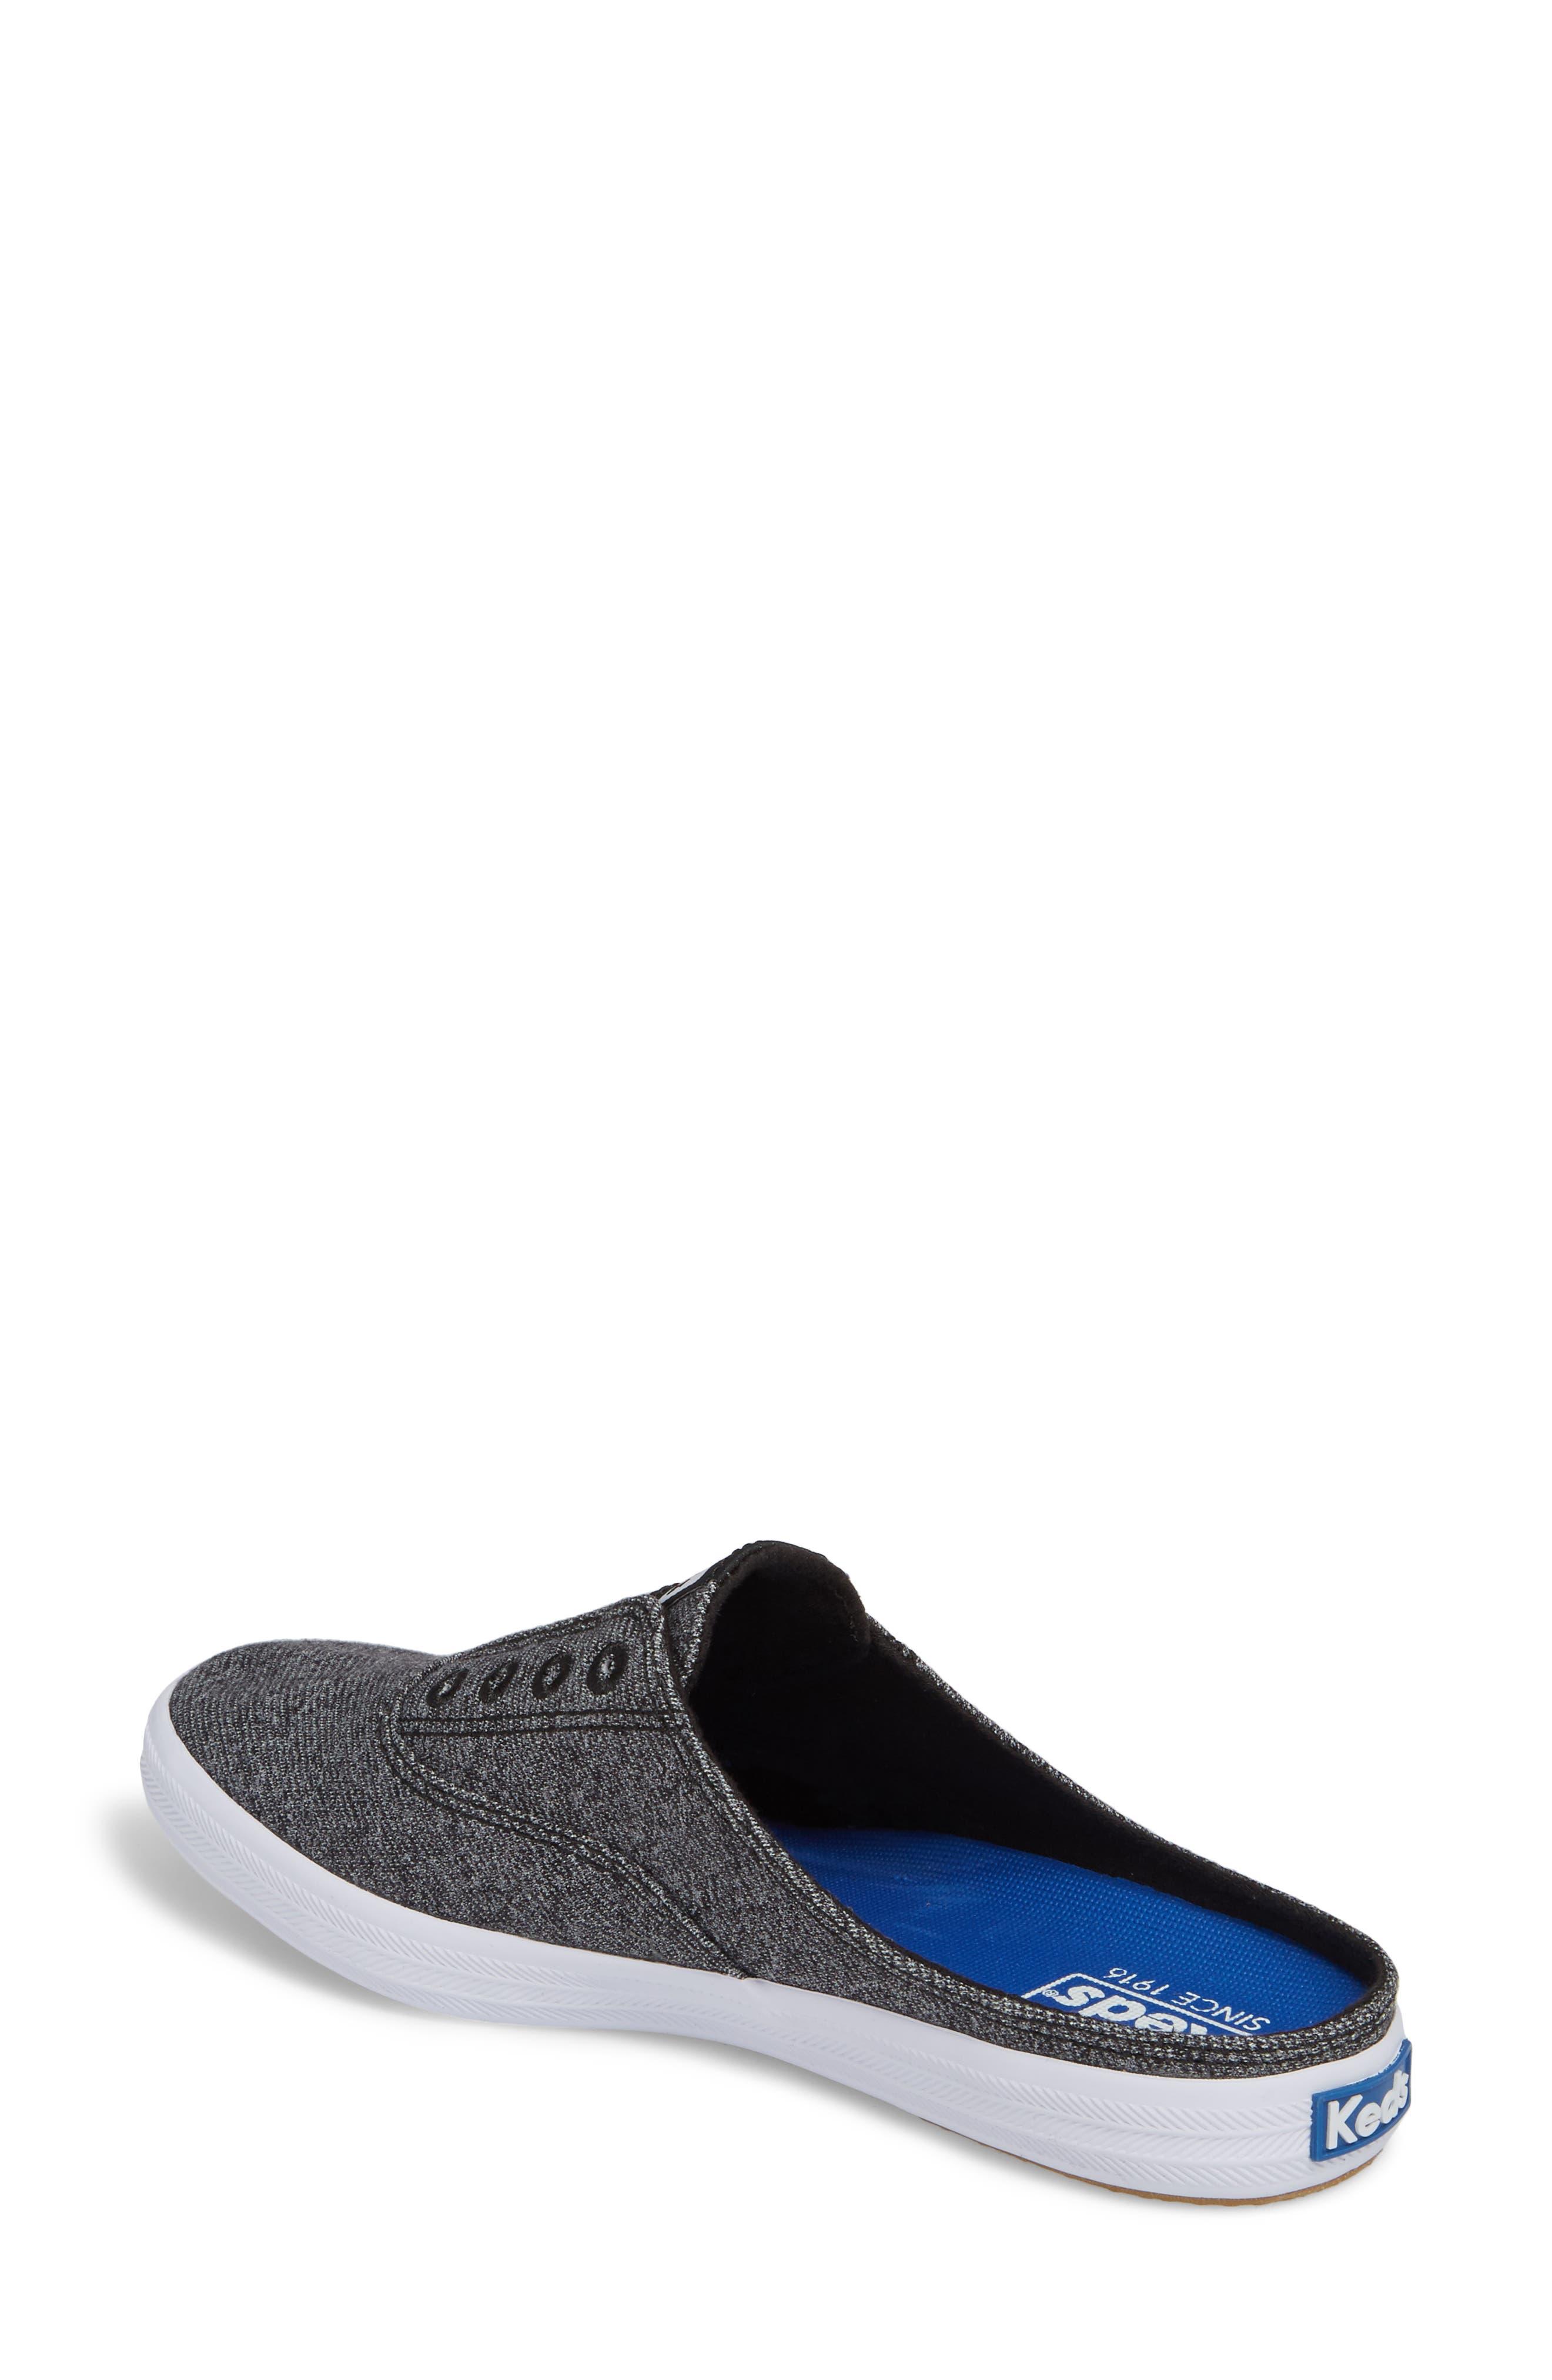 Moxie Sneaker Mule,                             Alternate thumbnail 2, color,                             021